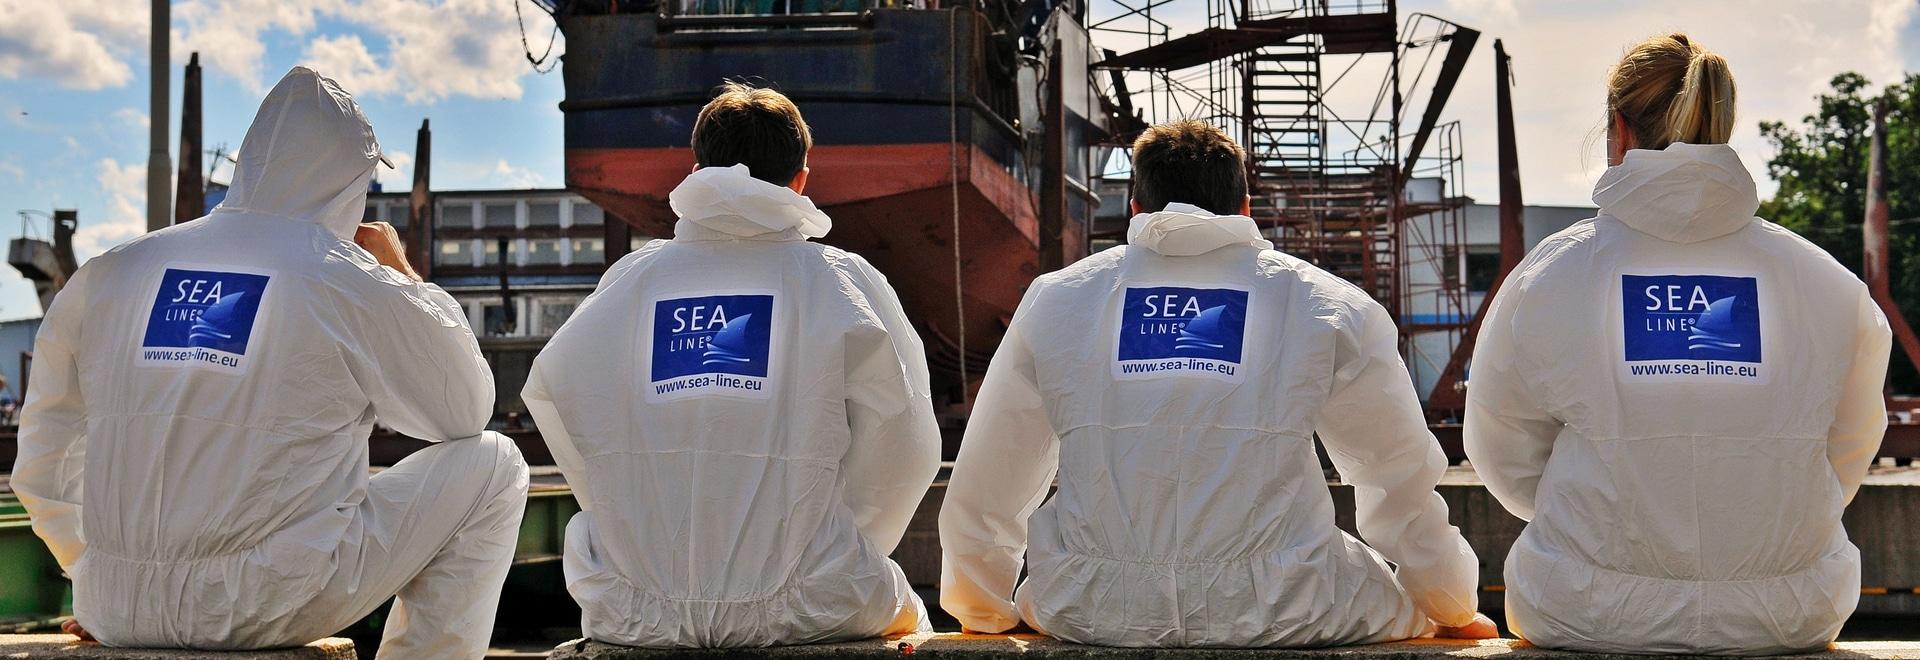 Distribution de ligne de la mer